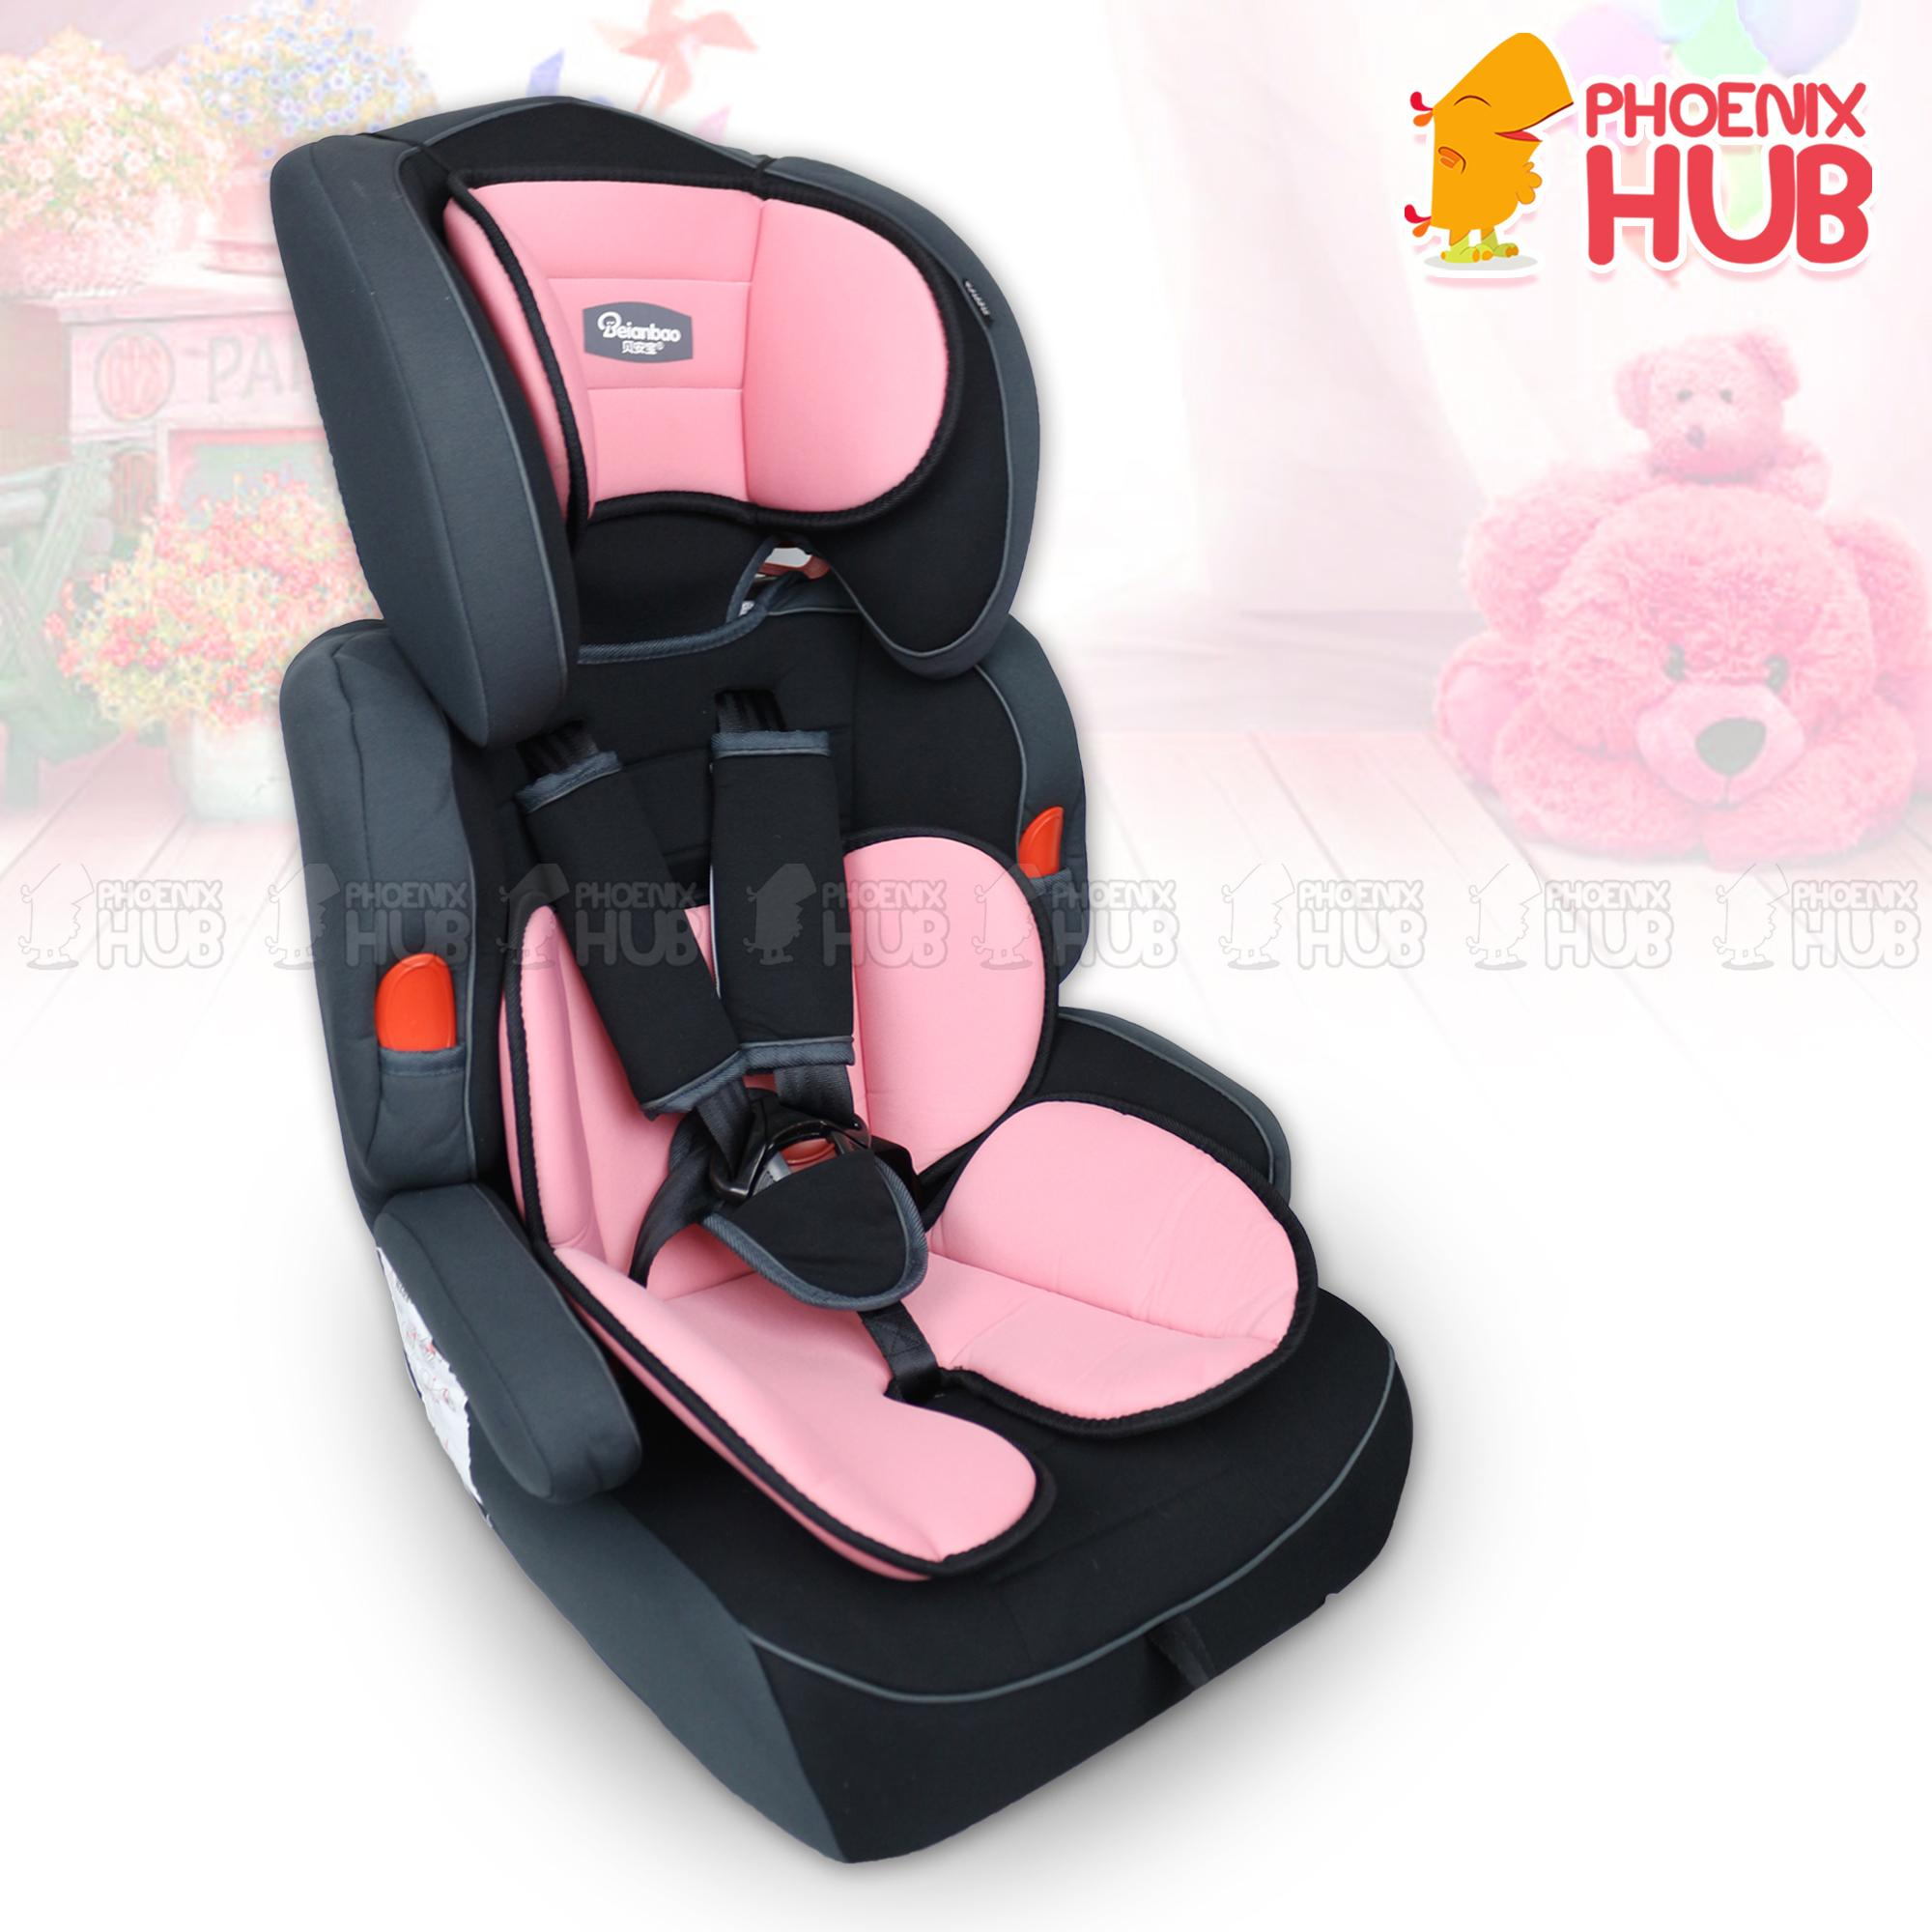 PhoenixHub All NEW Elegant Designed Baby